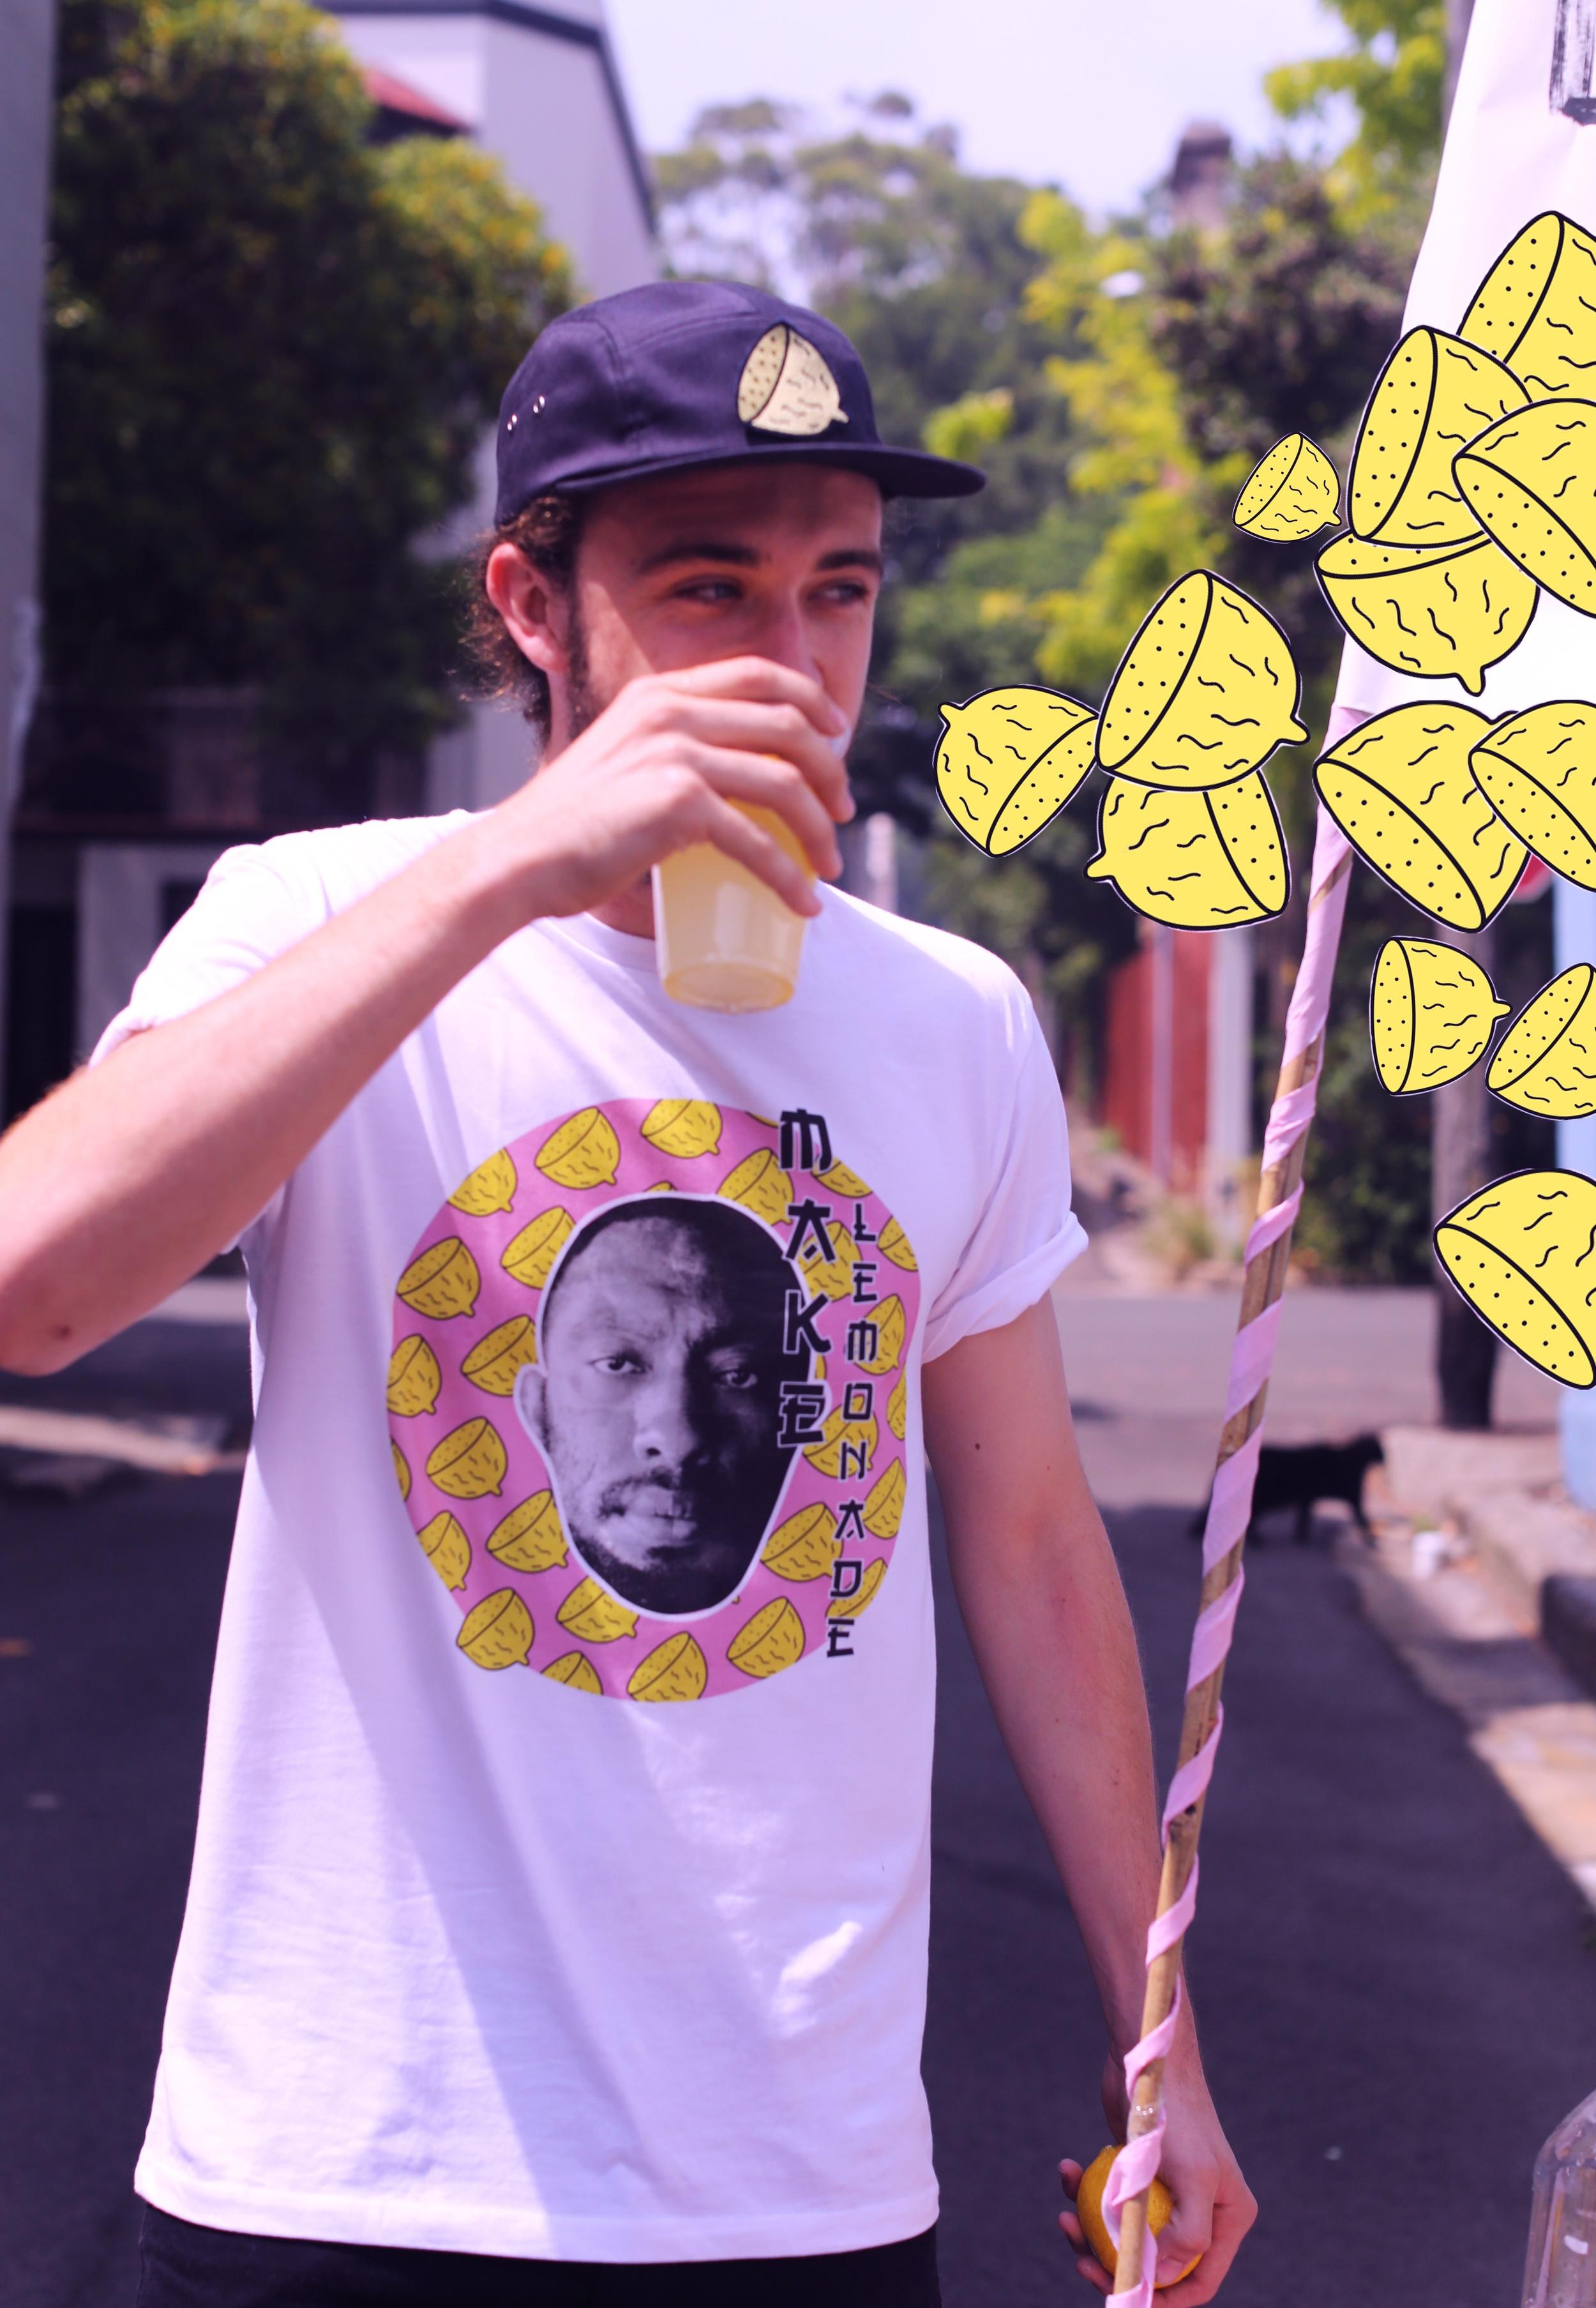 LemonHatFinal4mb.jpg